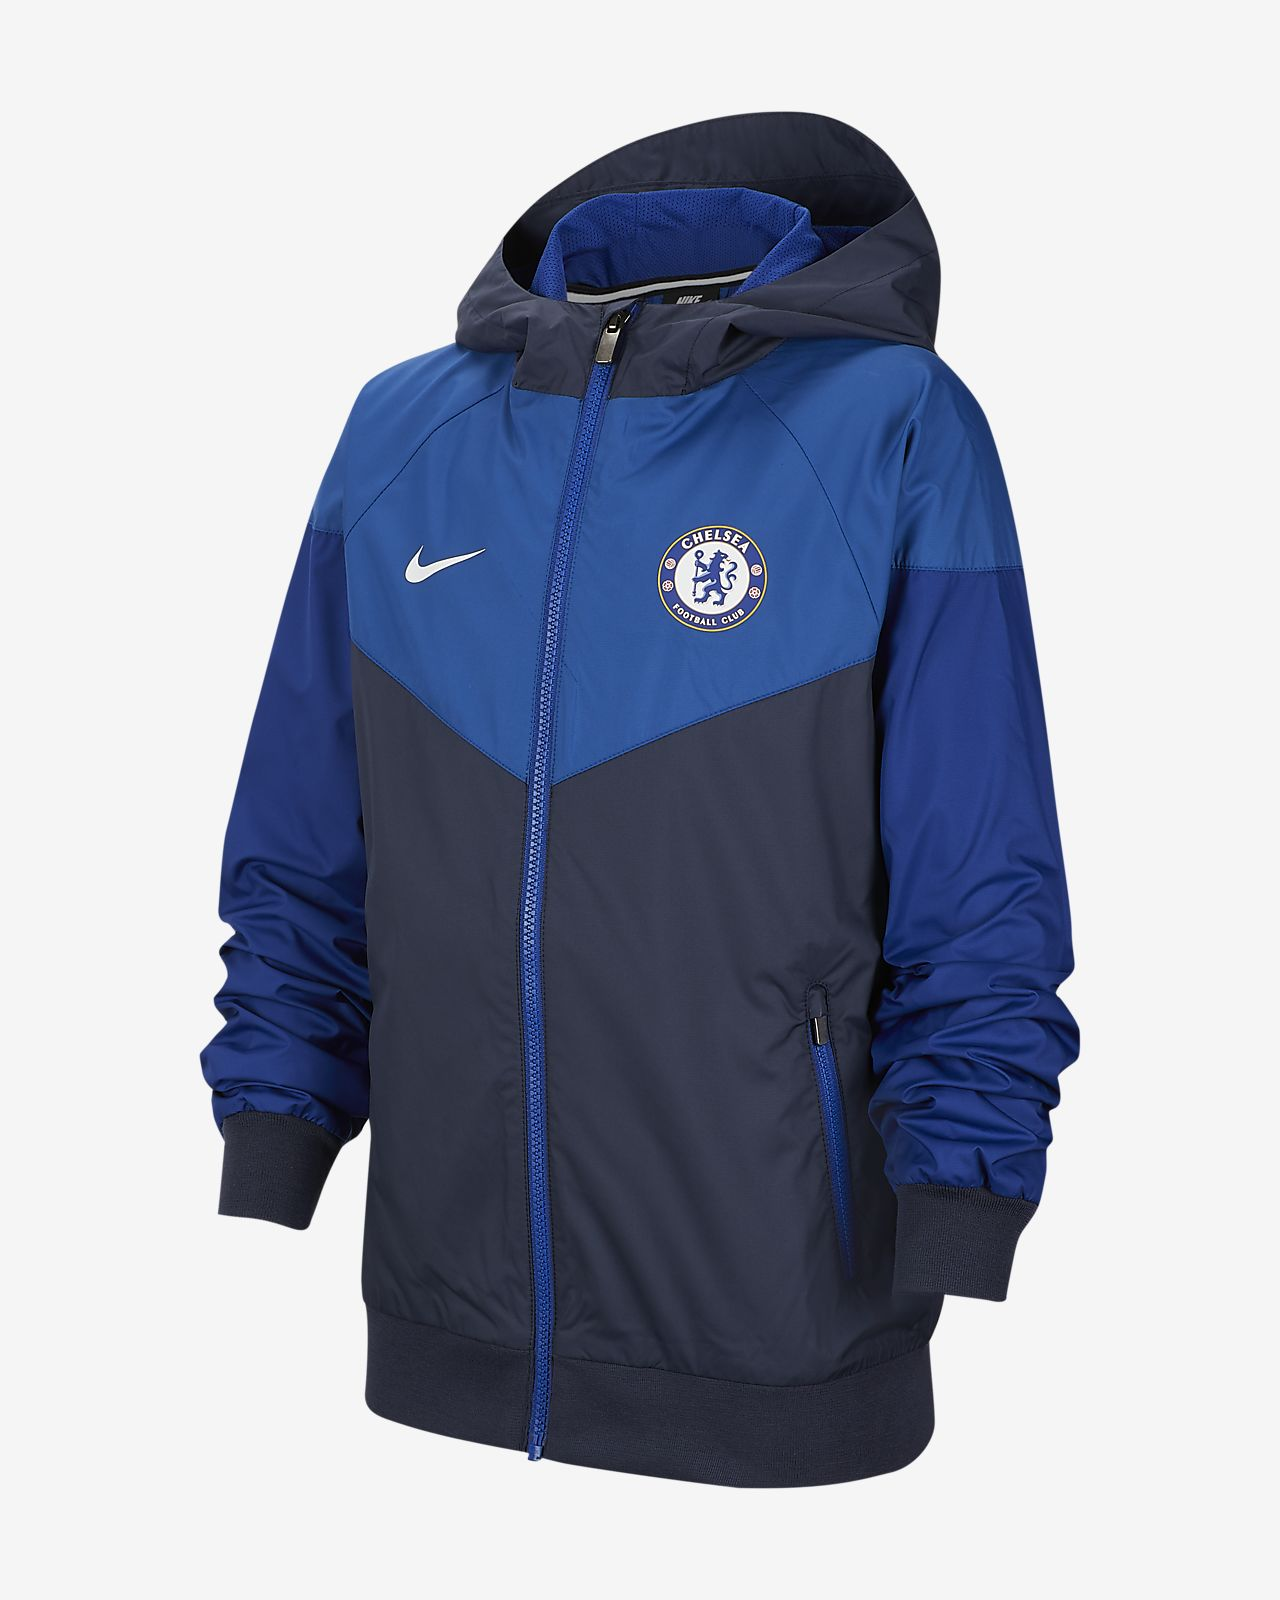 Chelsea FC Windrunner Big Kids' Jacket